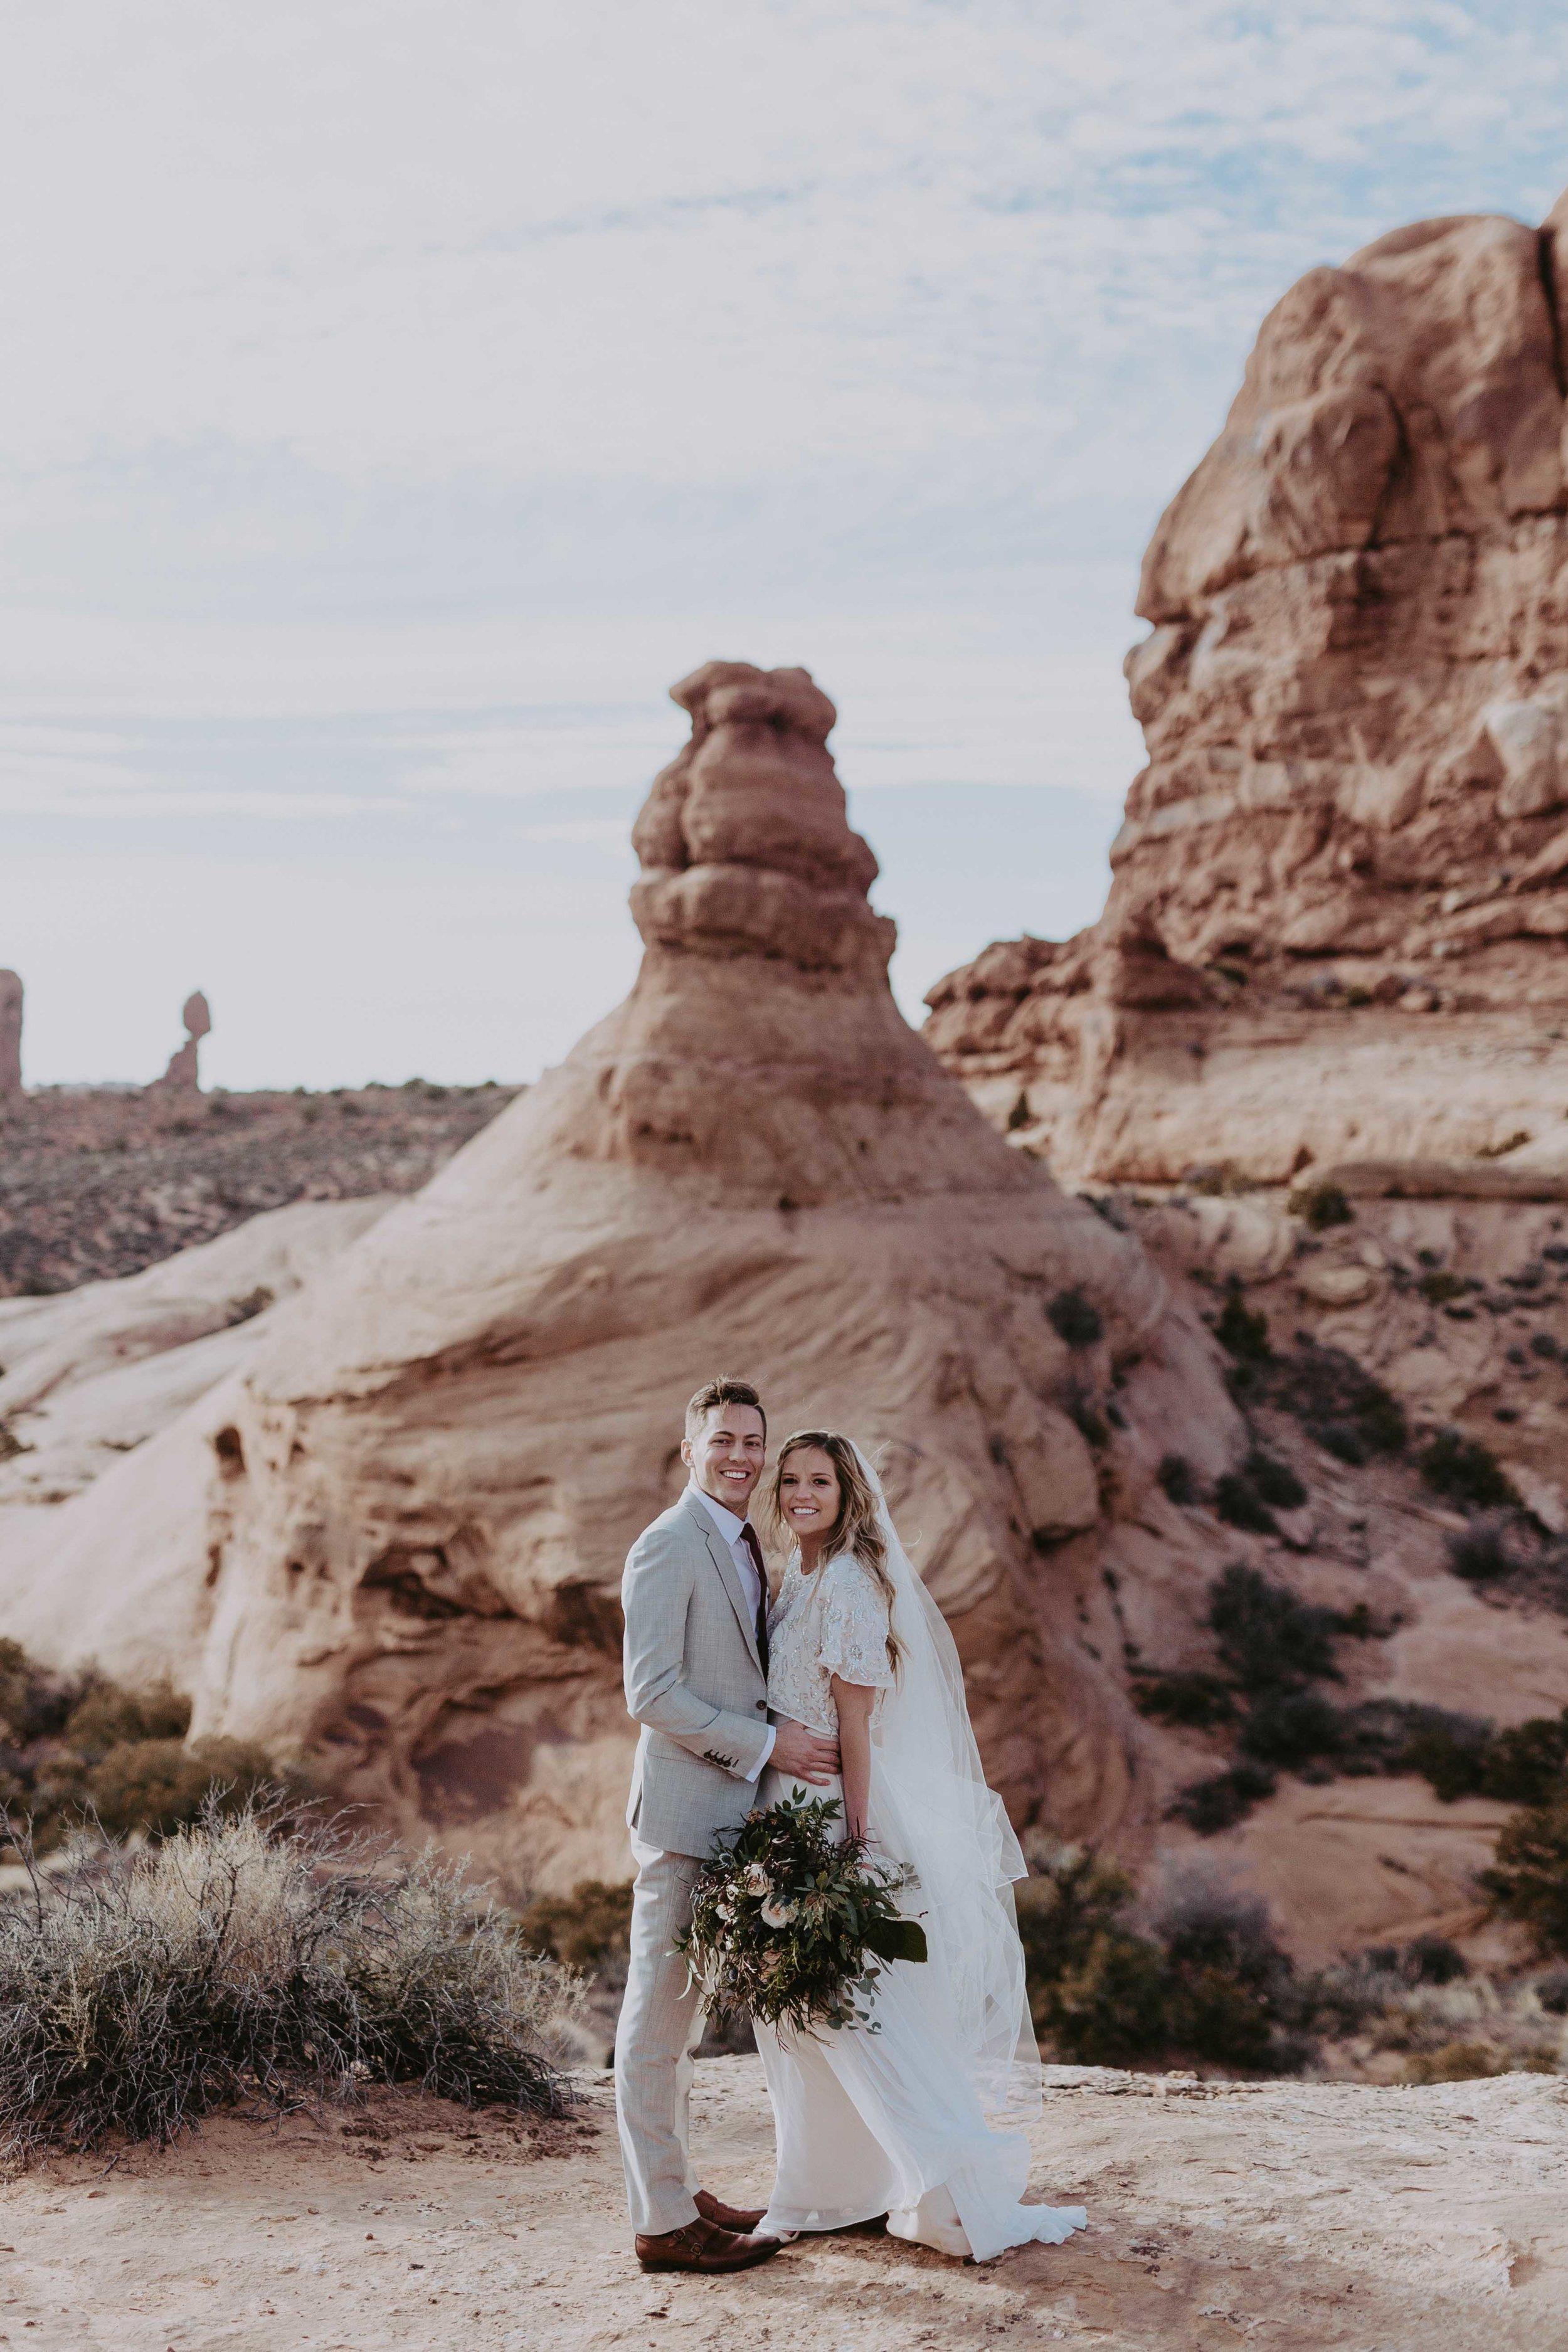 moab-wedding-photographer-14.jpg